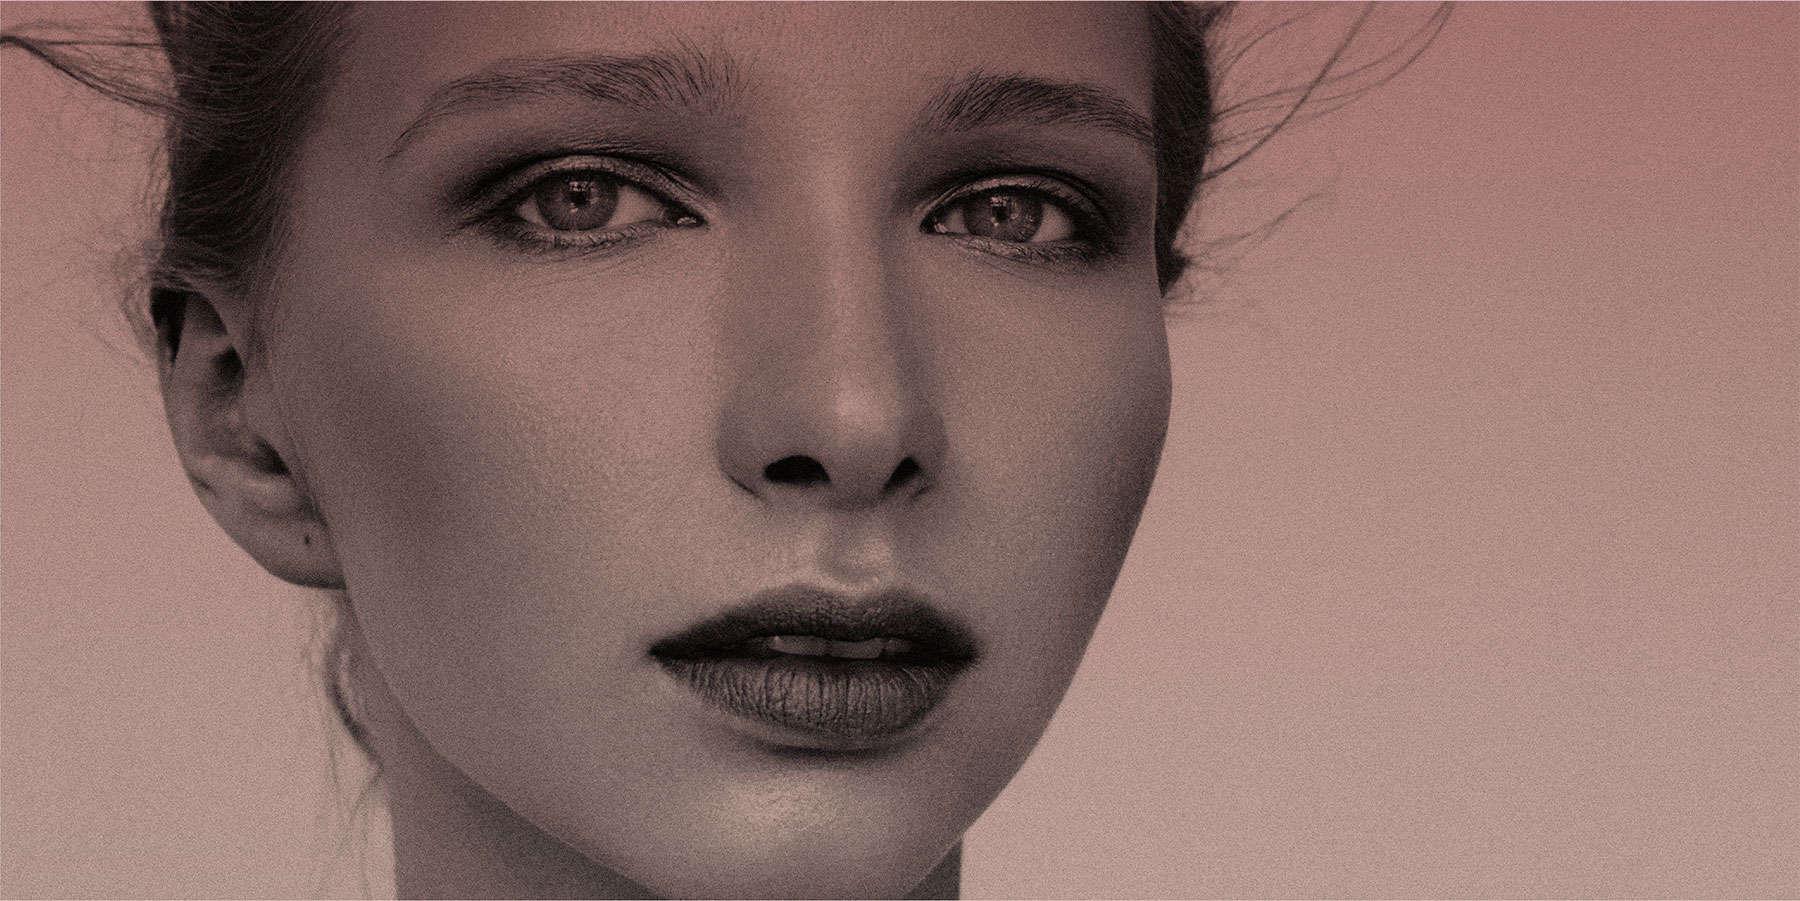 Venus Viva™ Skin Resurfacing Acne Scar Treatment image